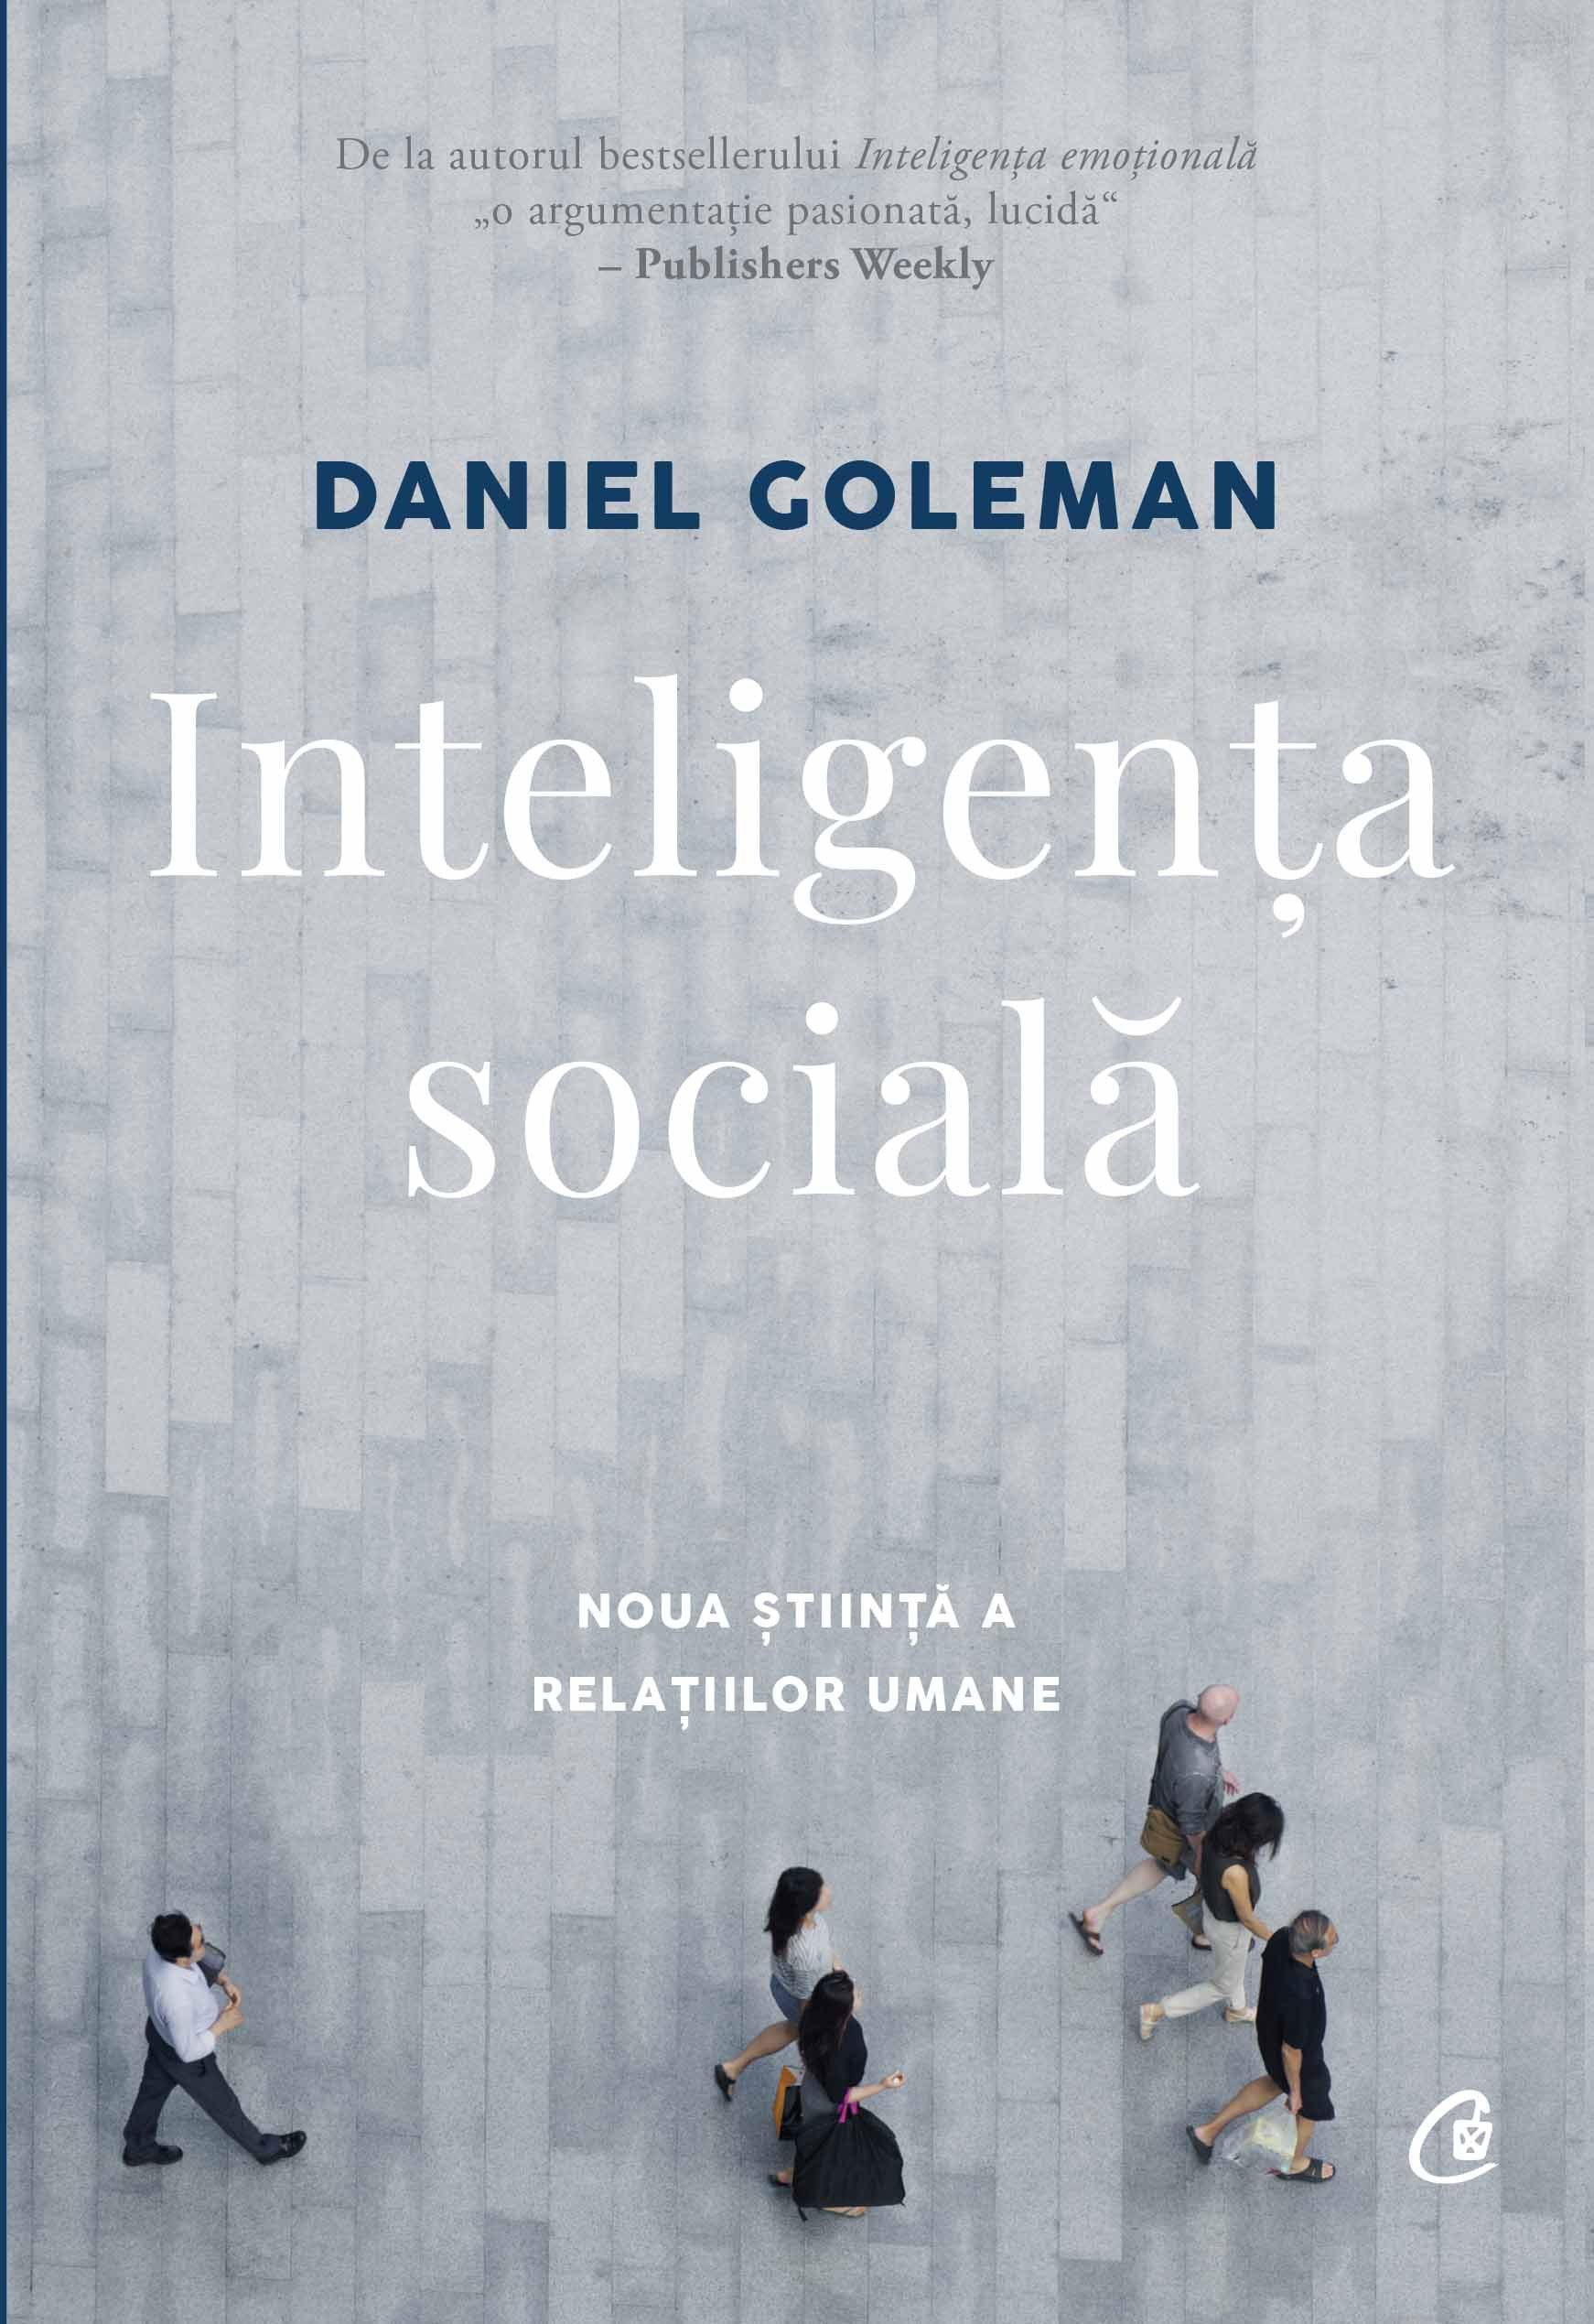 Daniel GOLEMAN - Inteligenta sociala